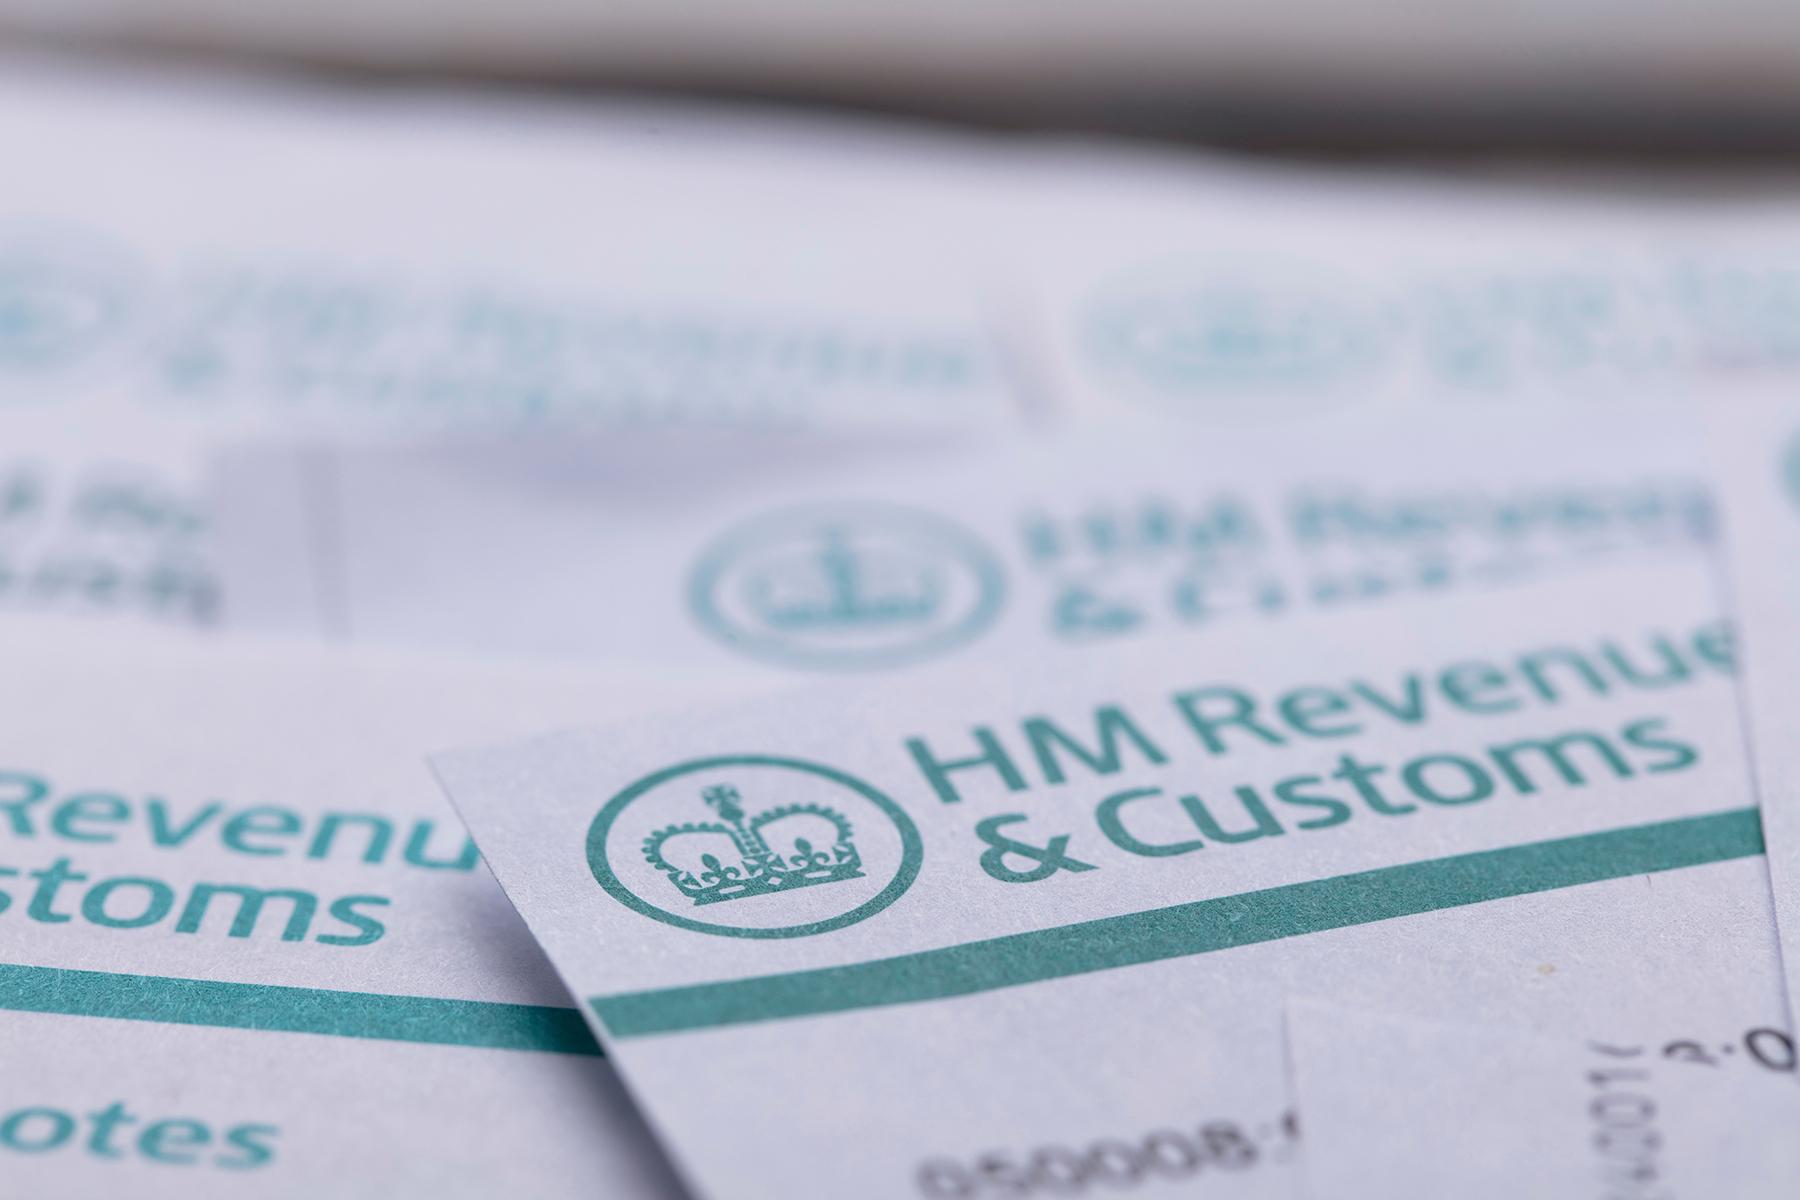 HMRC tax paperwork